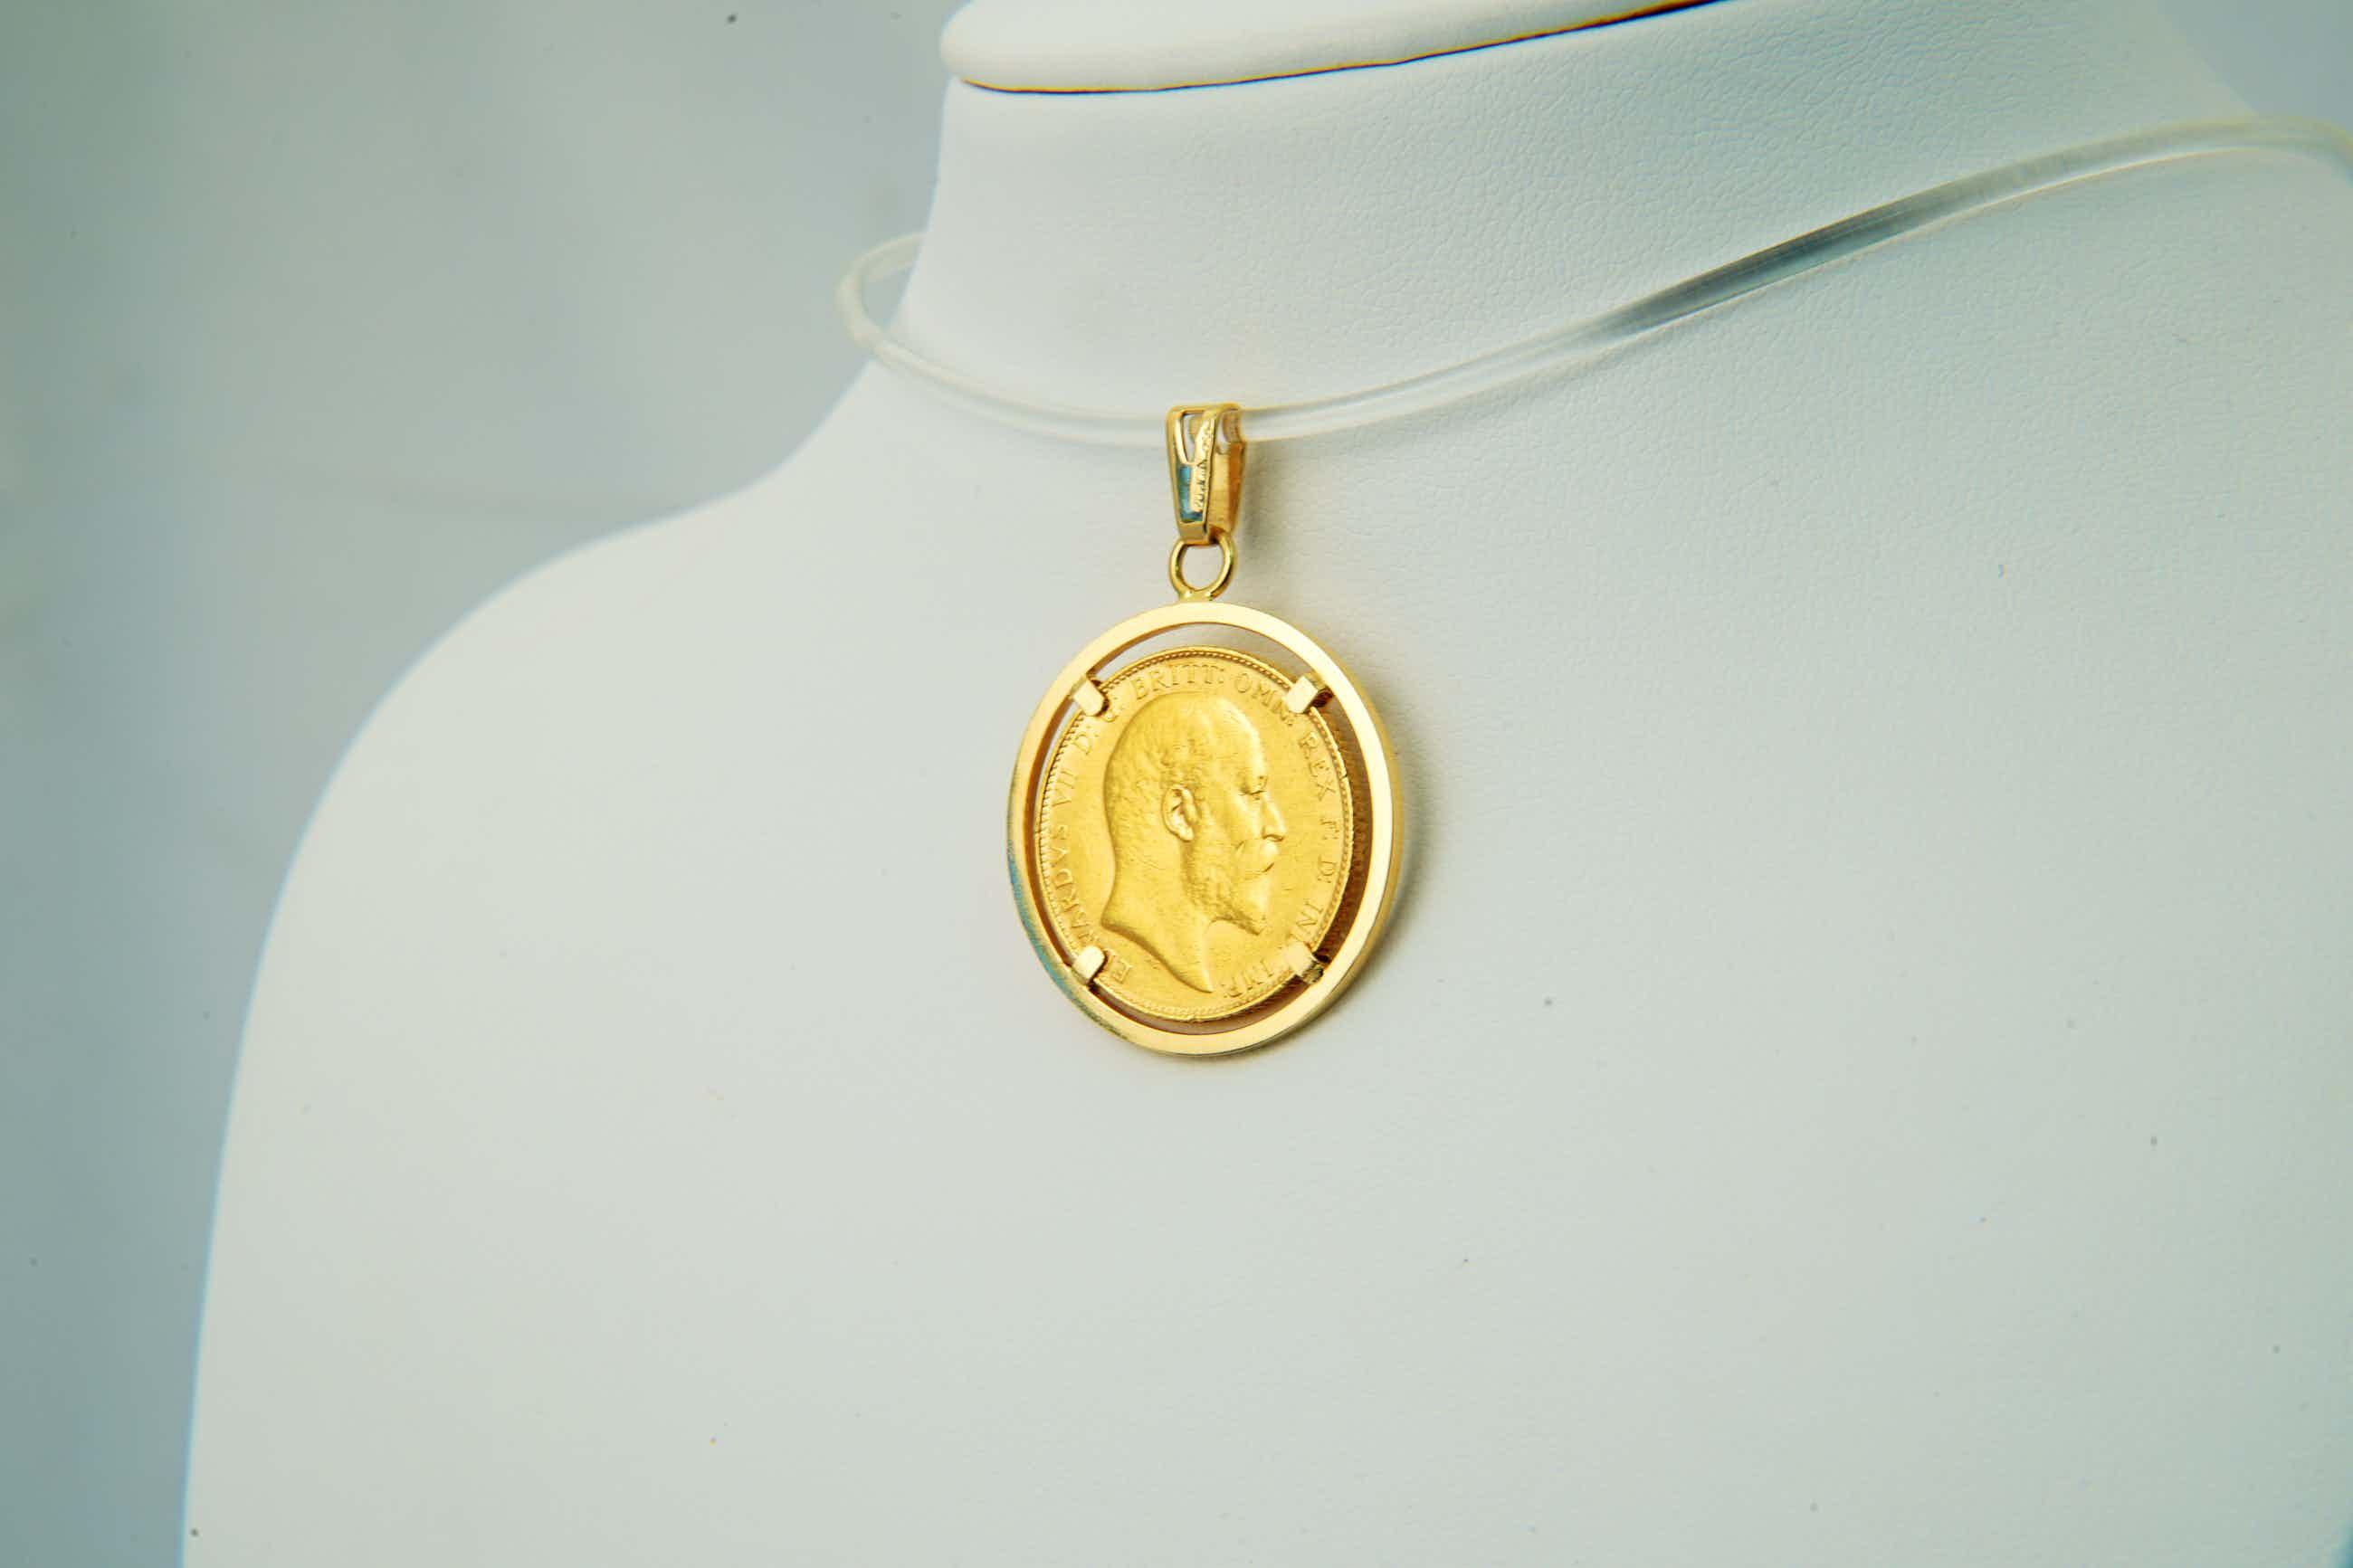 2544b- 18 Krt gouden montuur met losse Britse Sovereign munt Edward VII 1908 kopen? Bied vanaf 330!